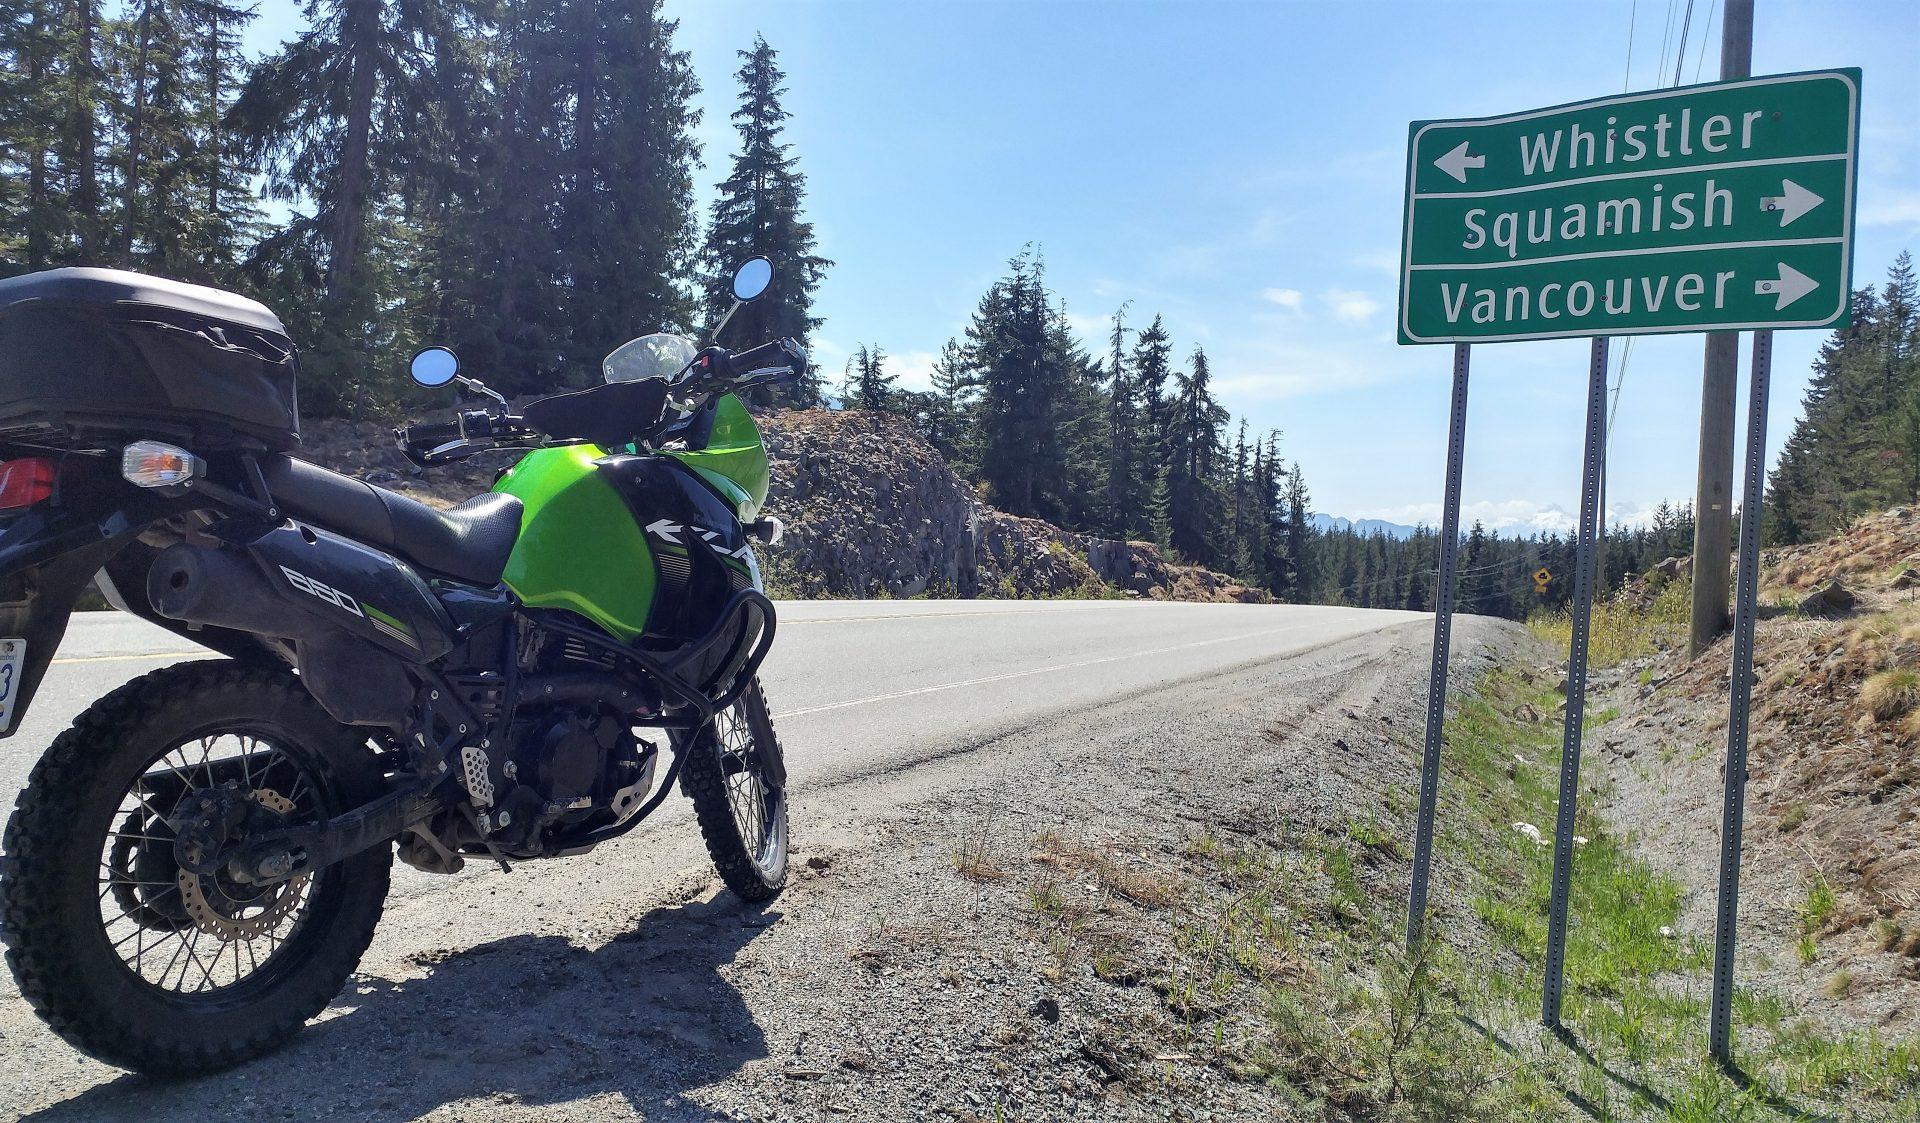 Sea to Sky Motorcycle Tour whistler Callaghan Valley